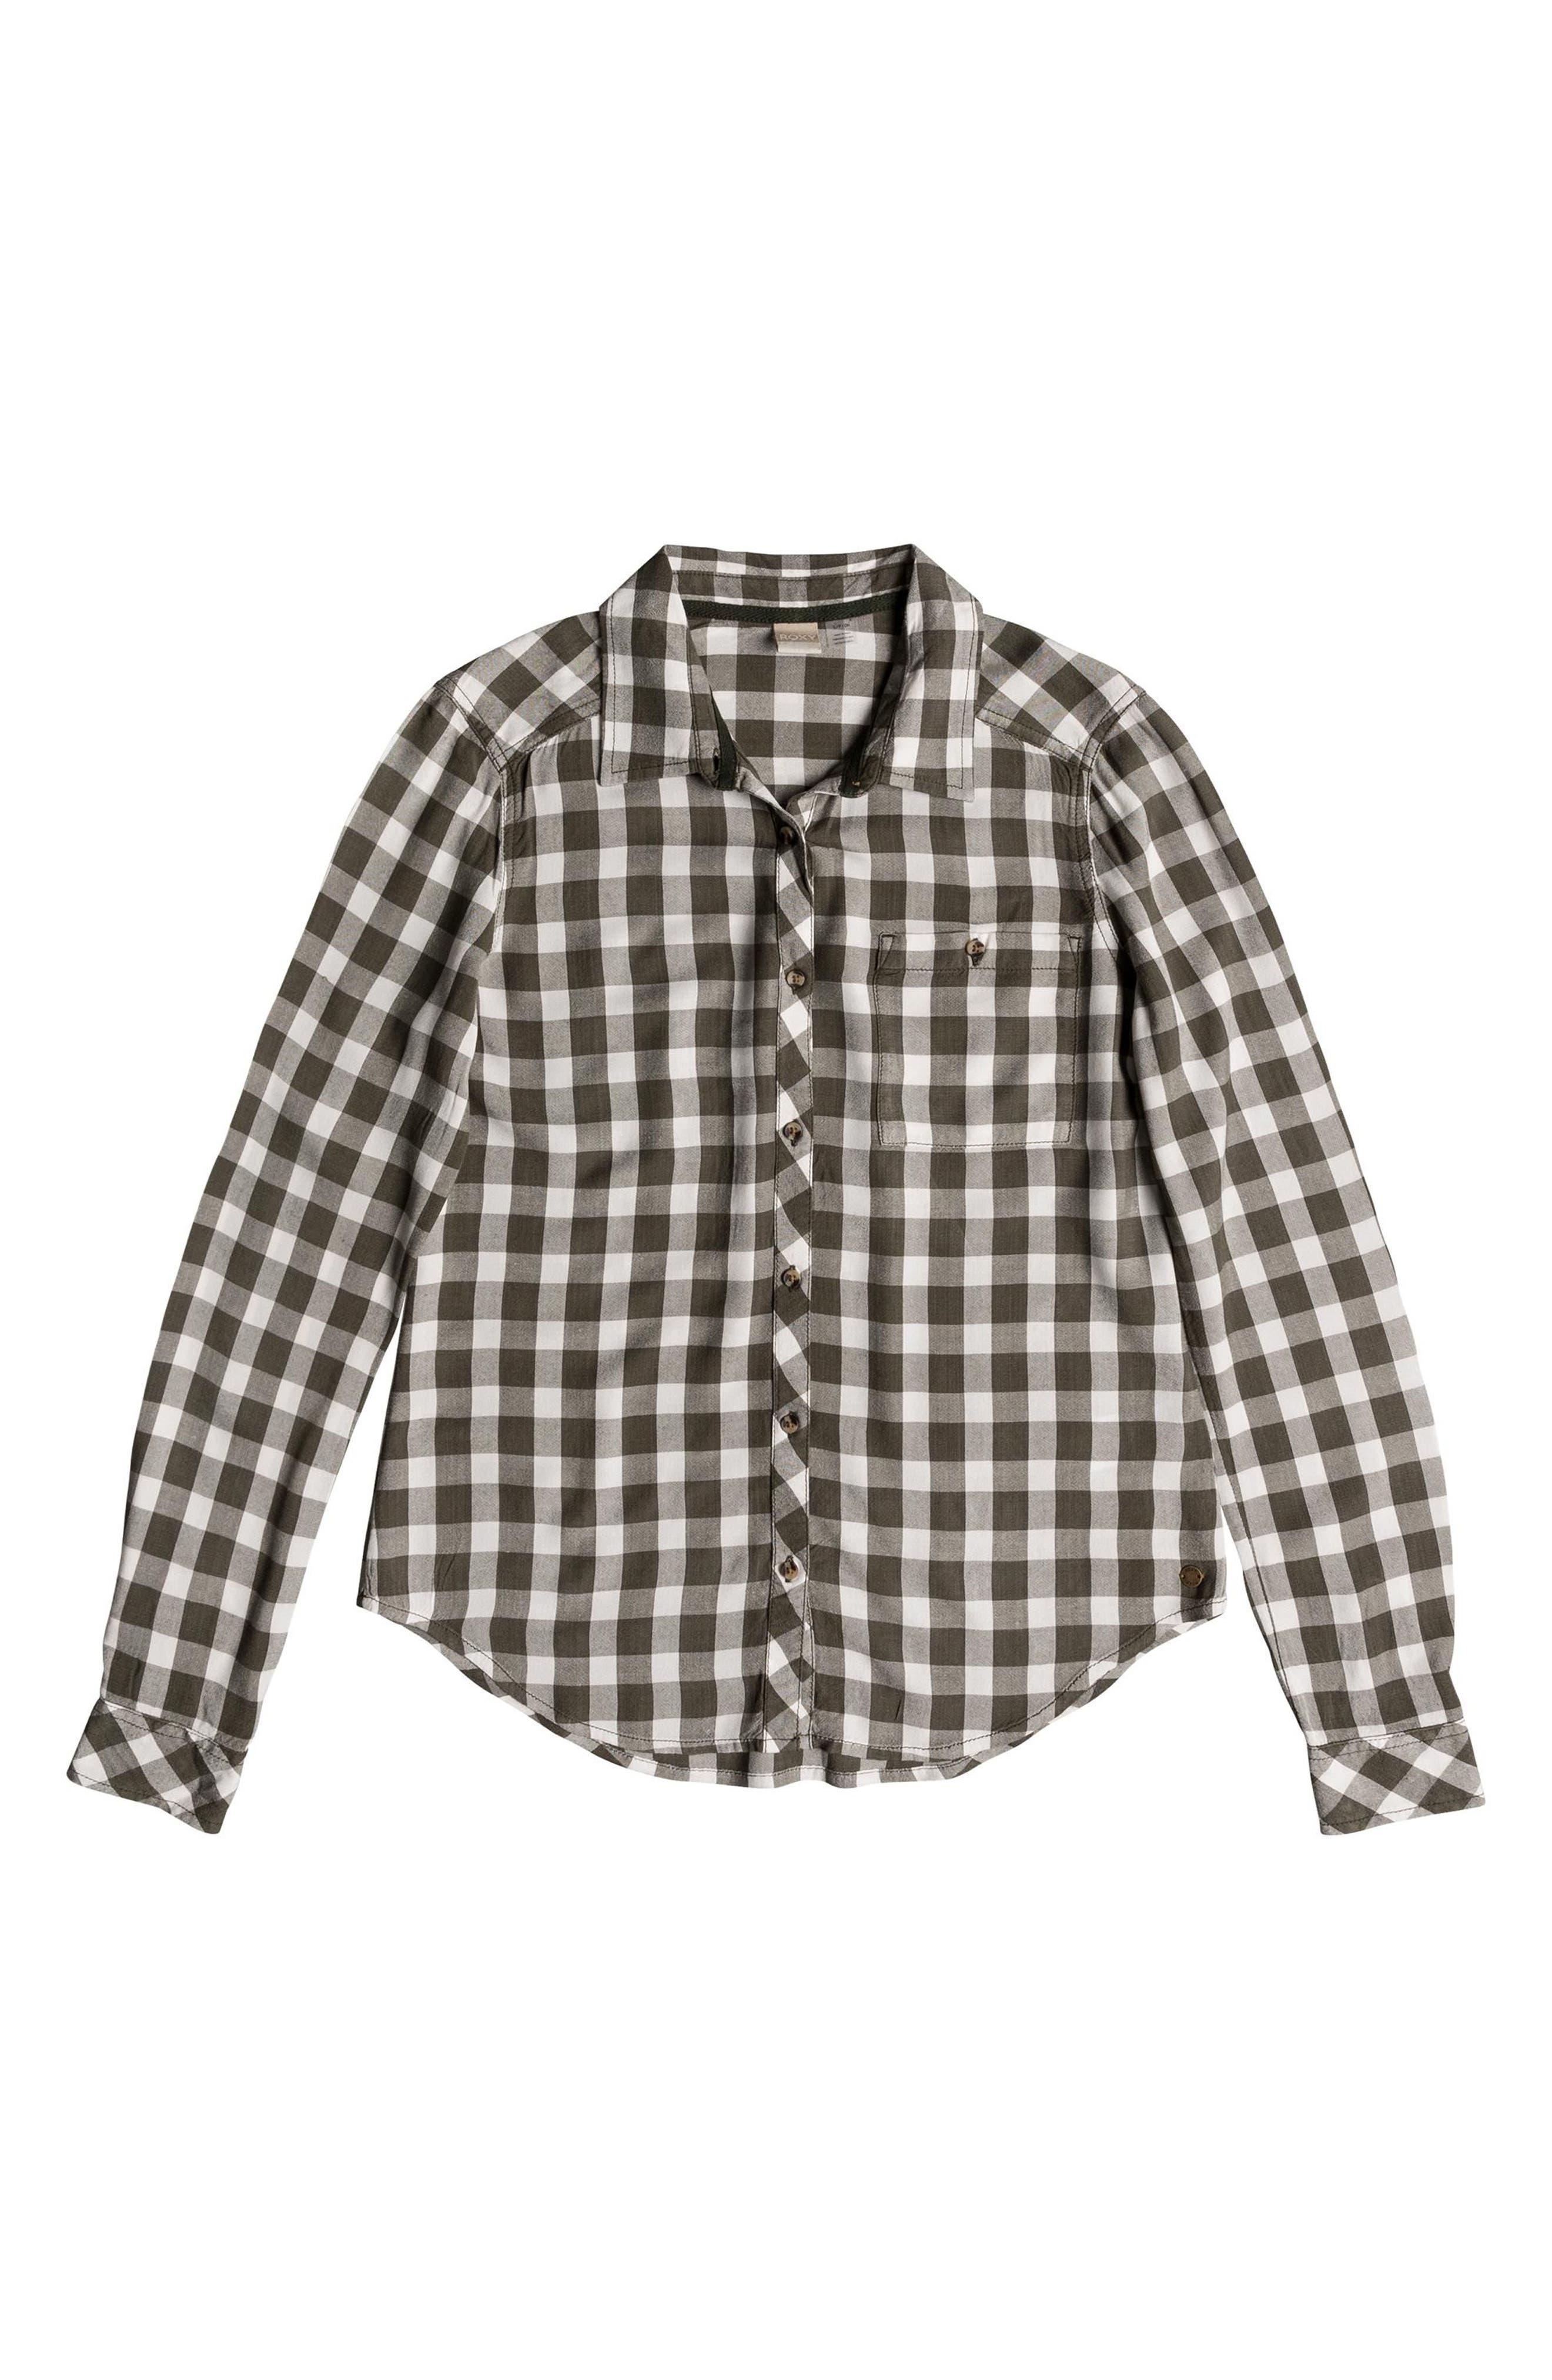 Capital Dream Check Shirt,                             Alternate thumbnail 4, color,                             Thyme Northy Plaid